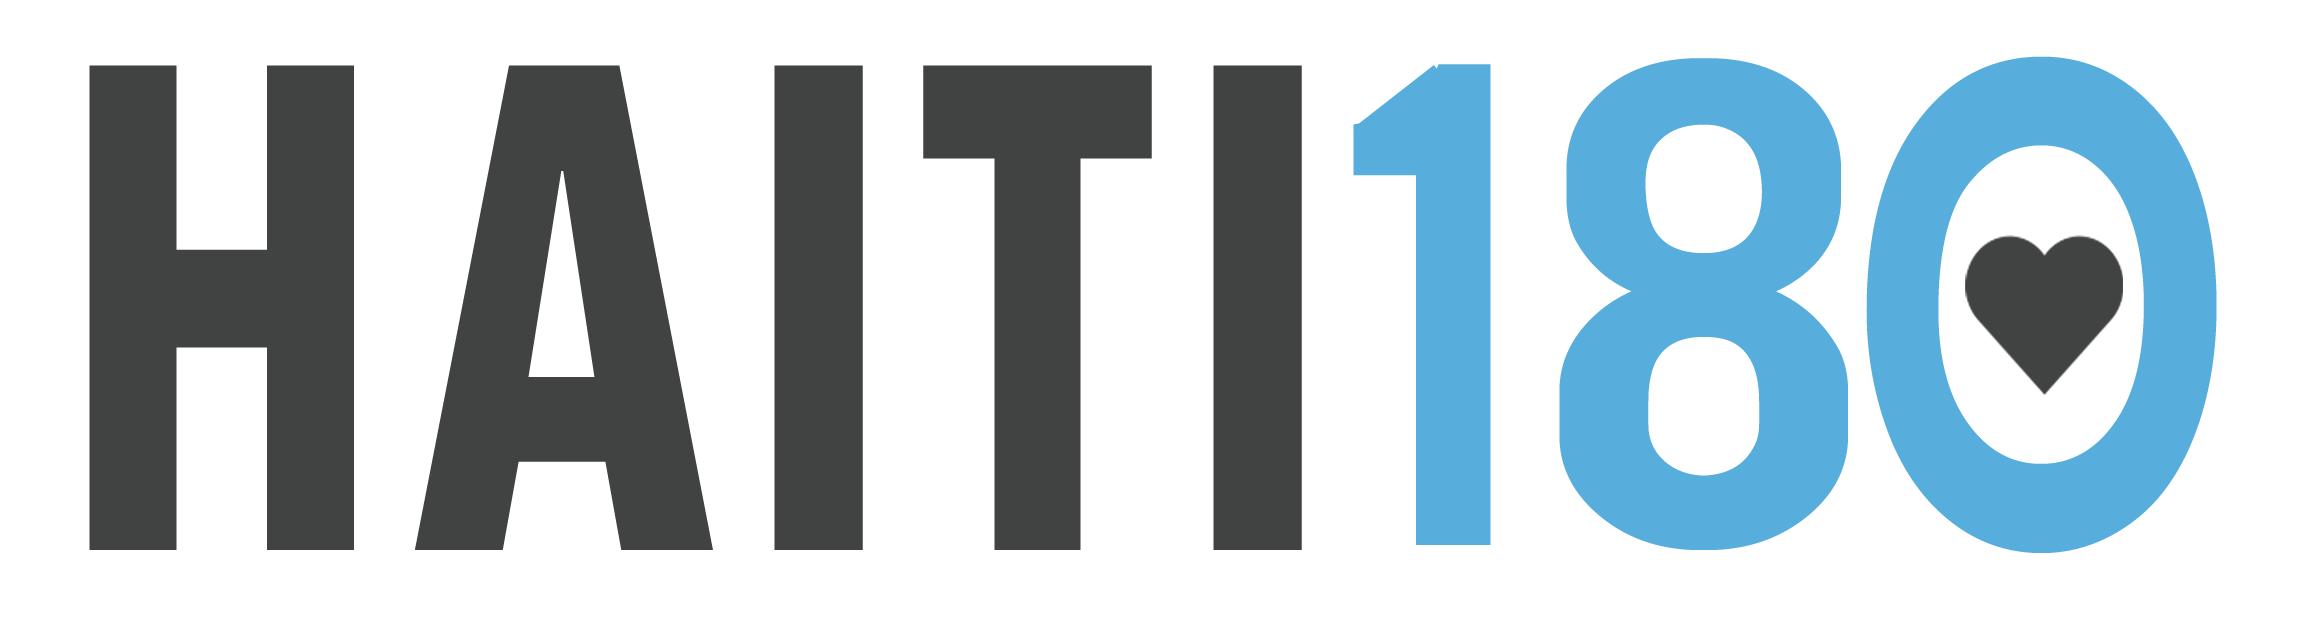 Haiti 180 new logo.png